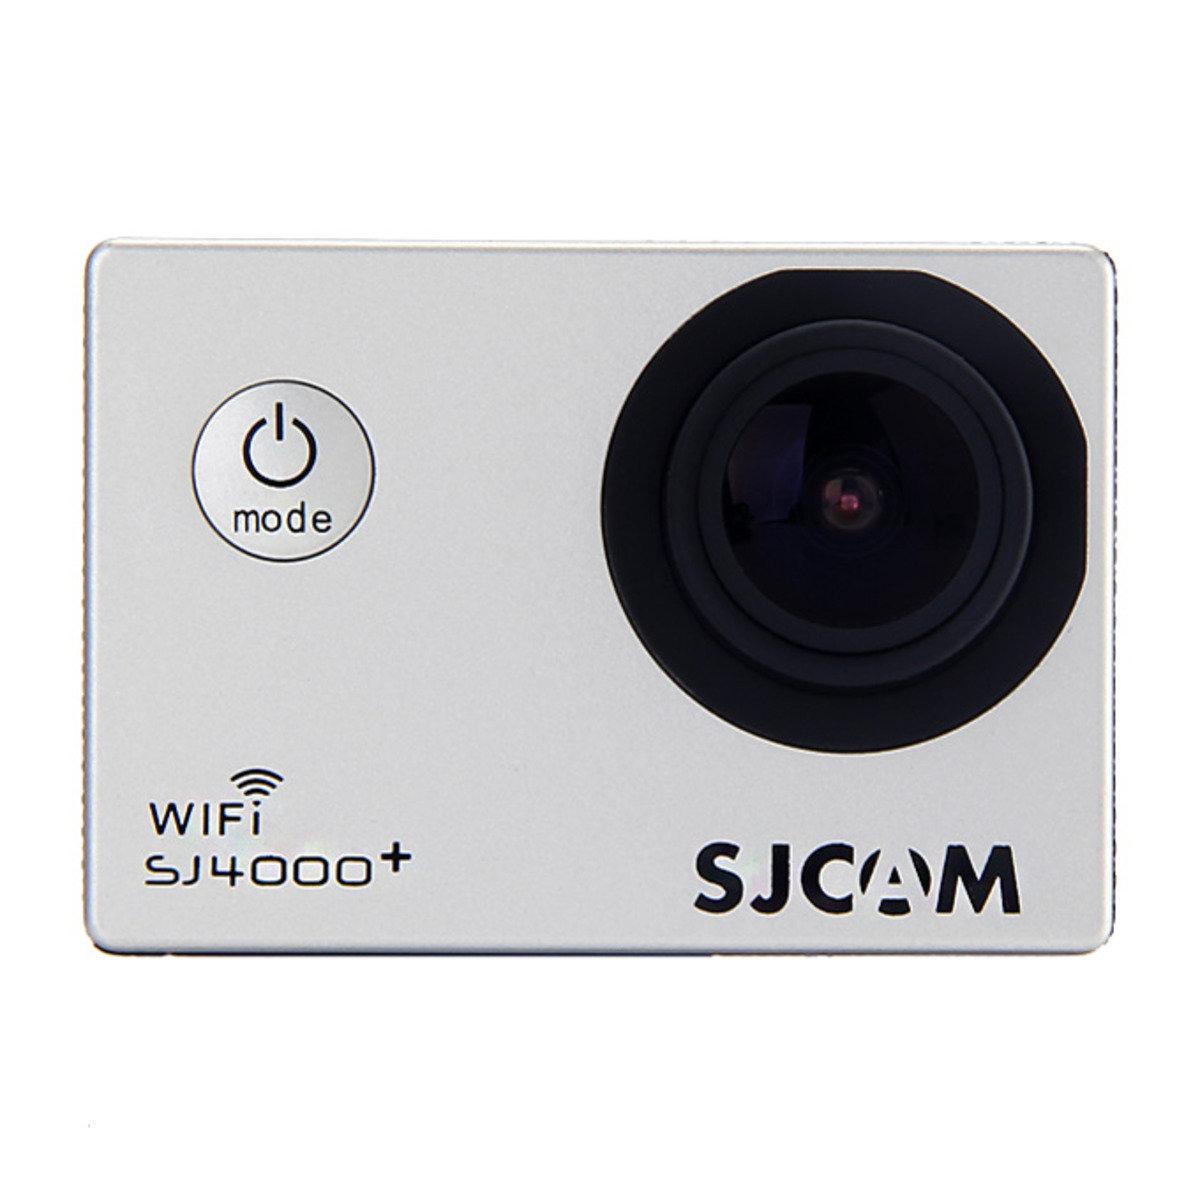 SJ4000+ 高清1.5寸屏幕微型防水運動攝像機-(WIFI)